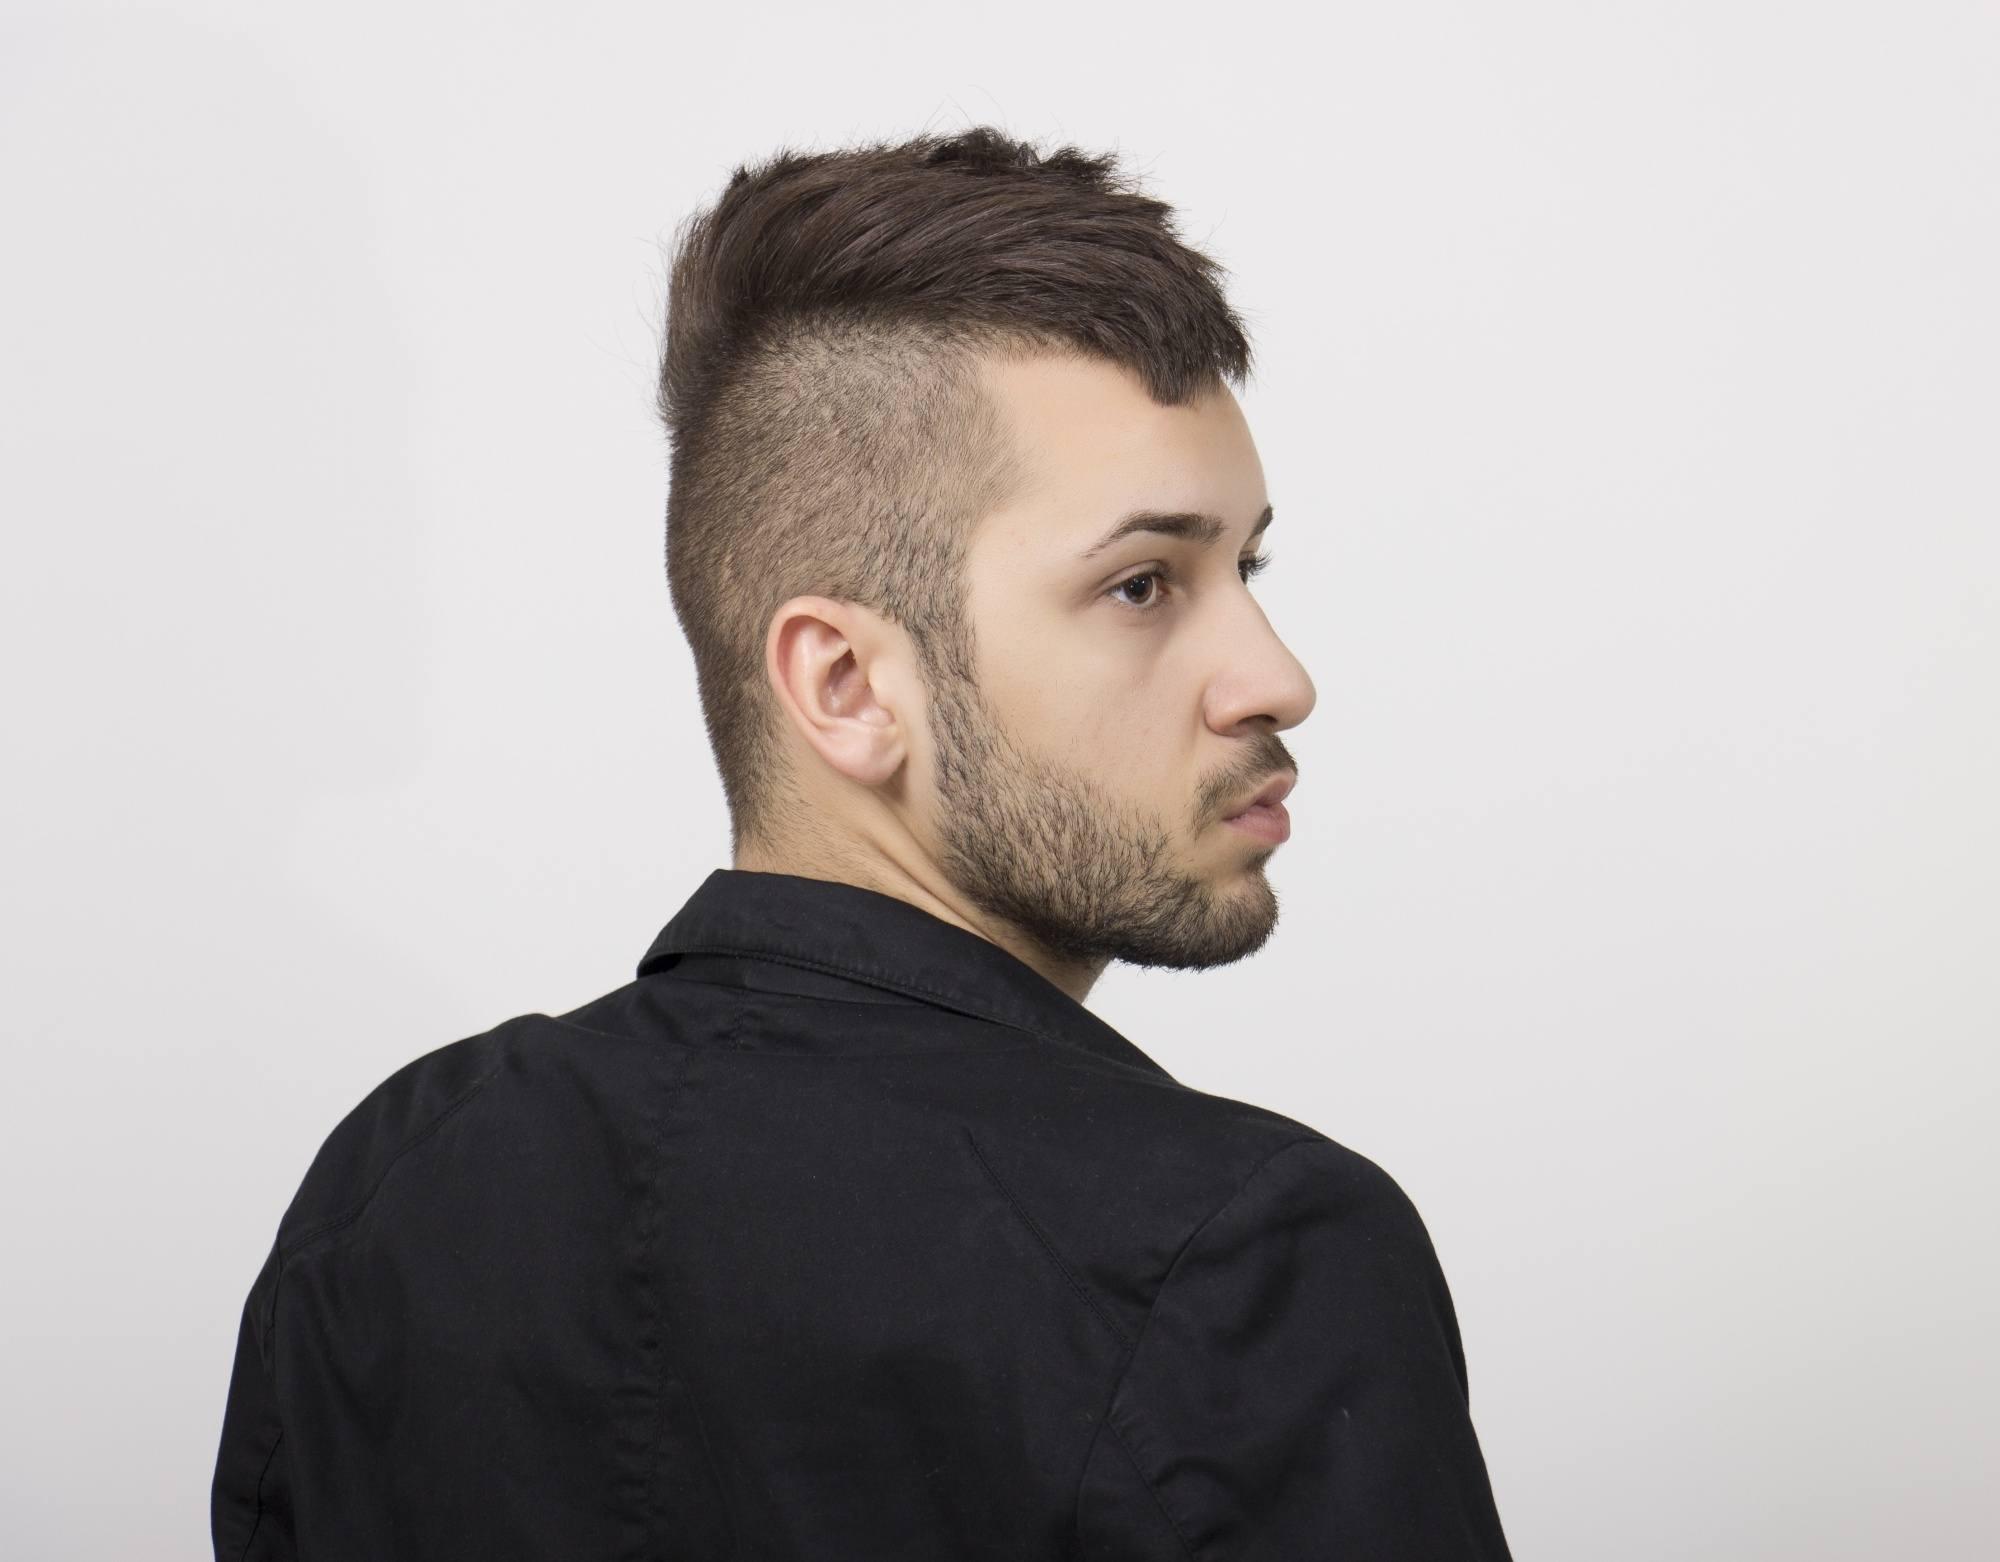 Mohawk fade: Man with mohawk fade dark hair wearing a dark jacket